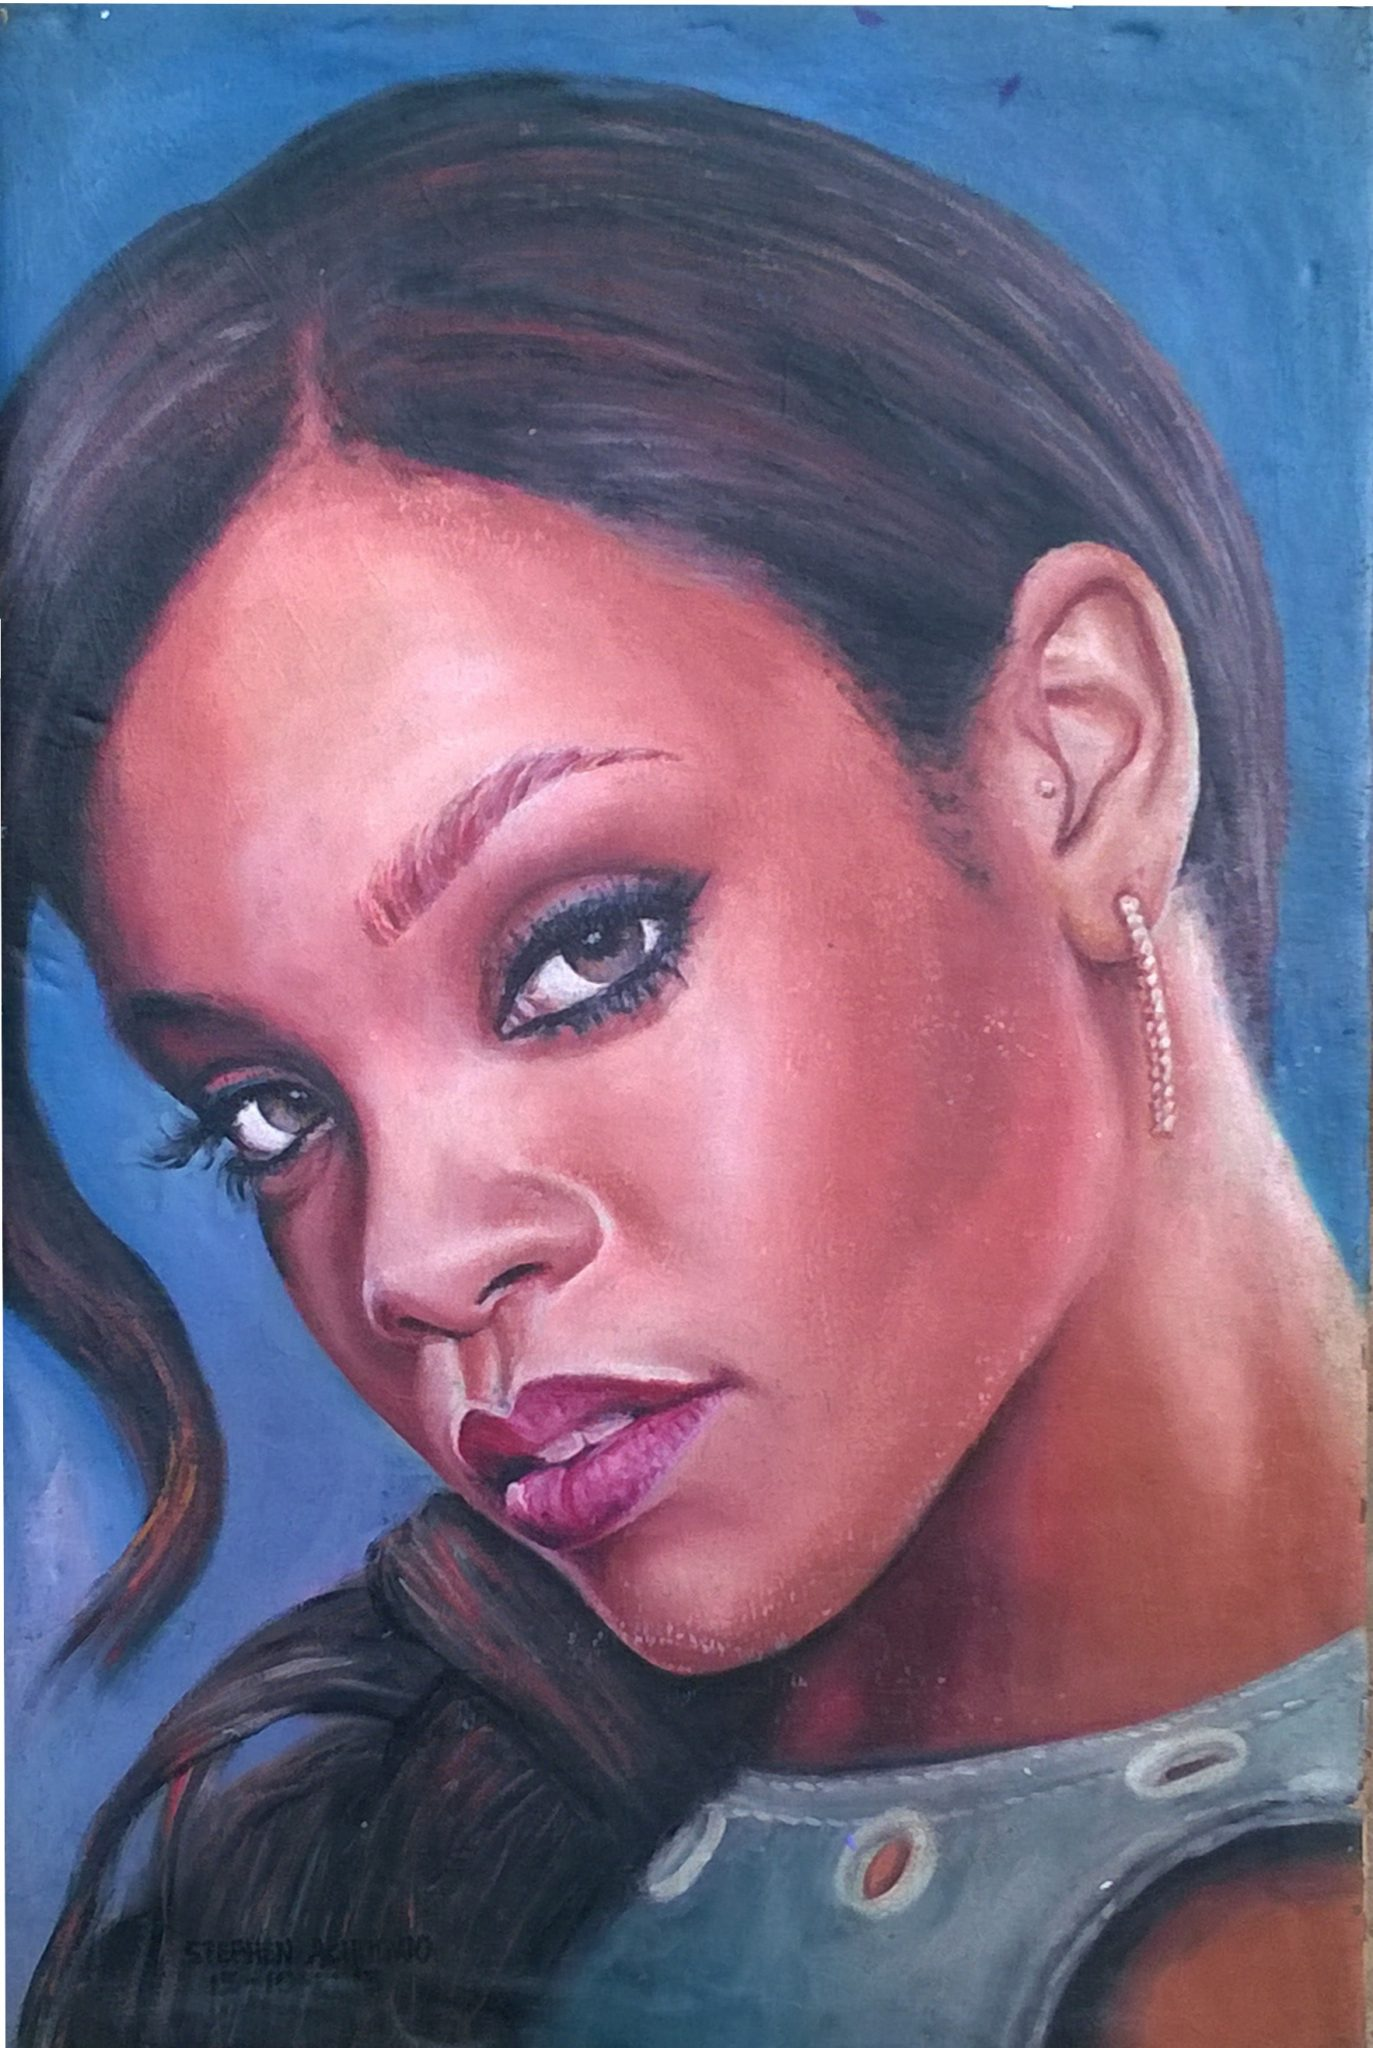 RiRi Rihanna